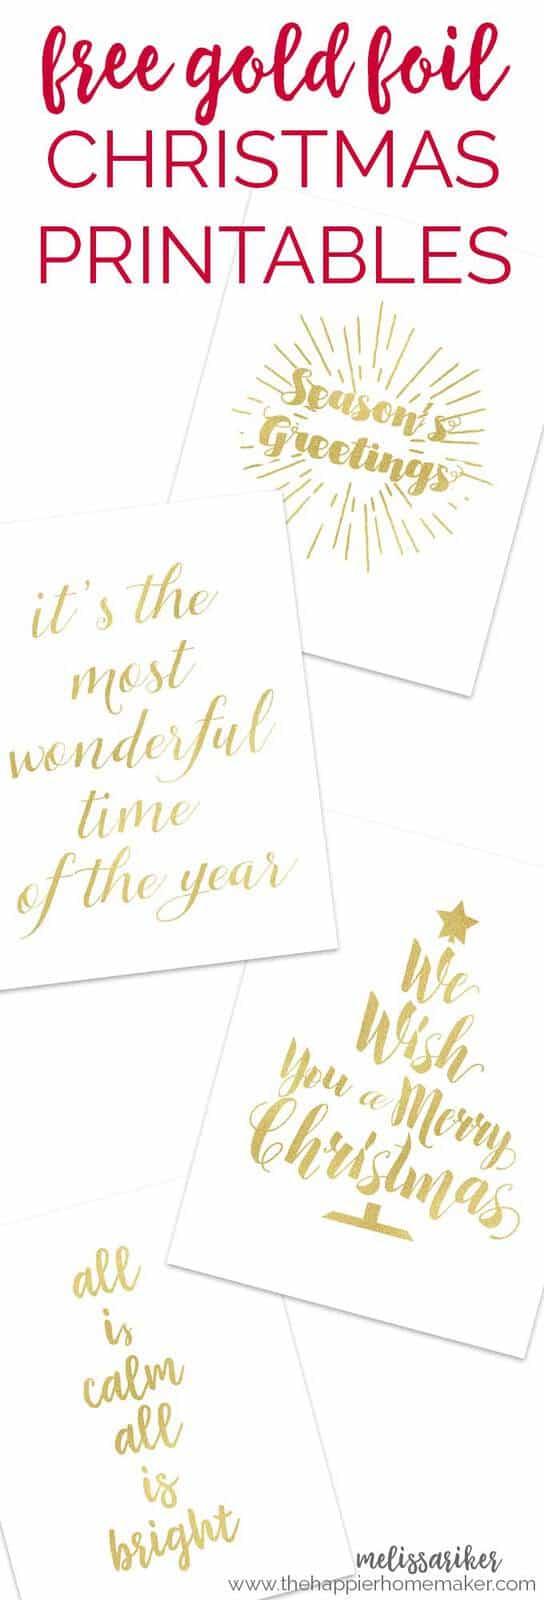 collage of Christmas printables